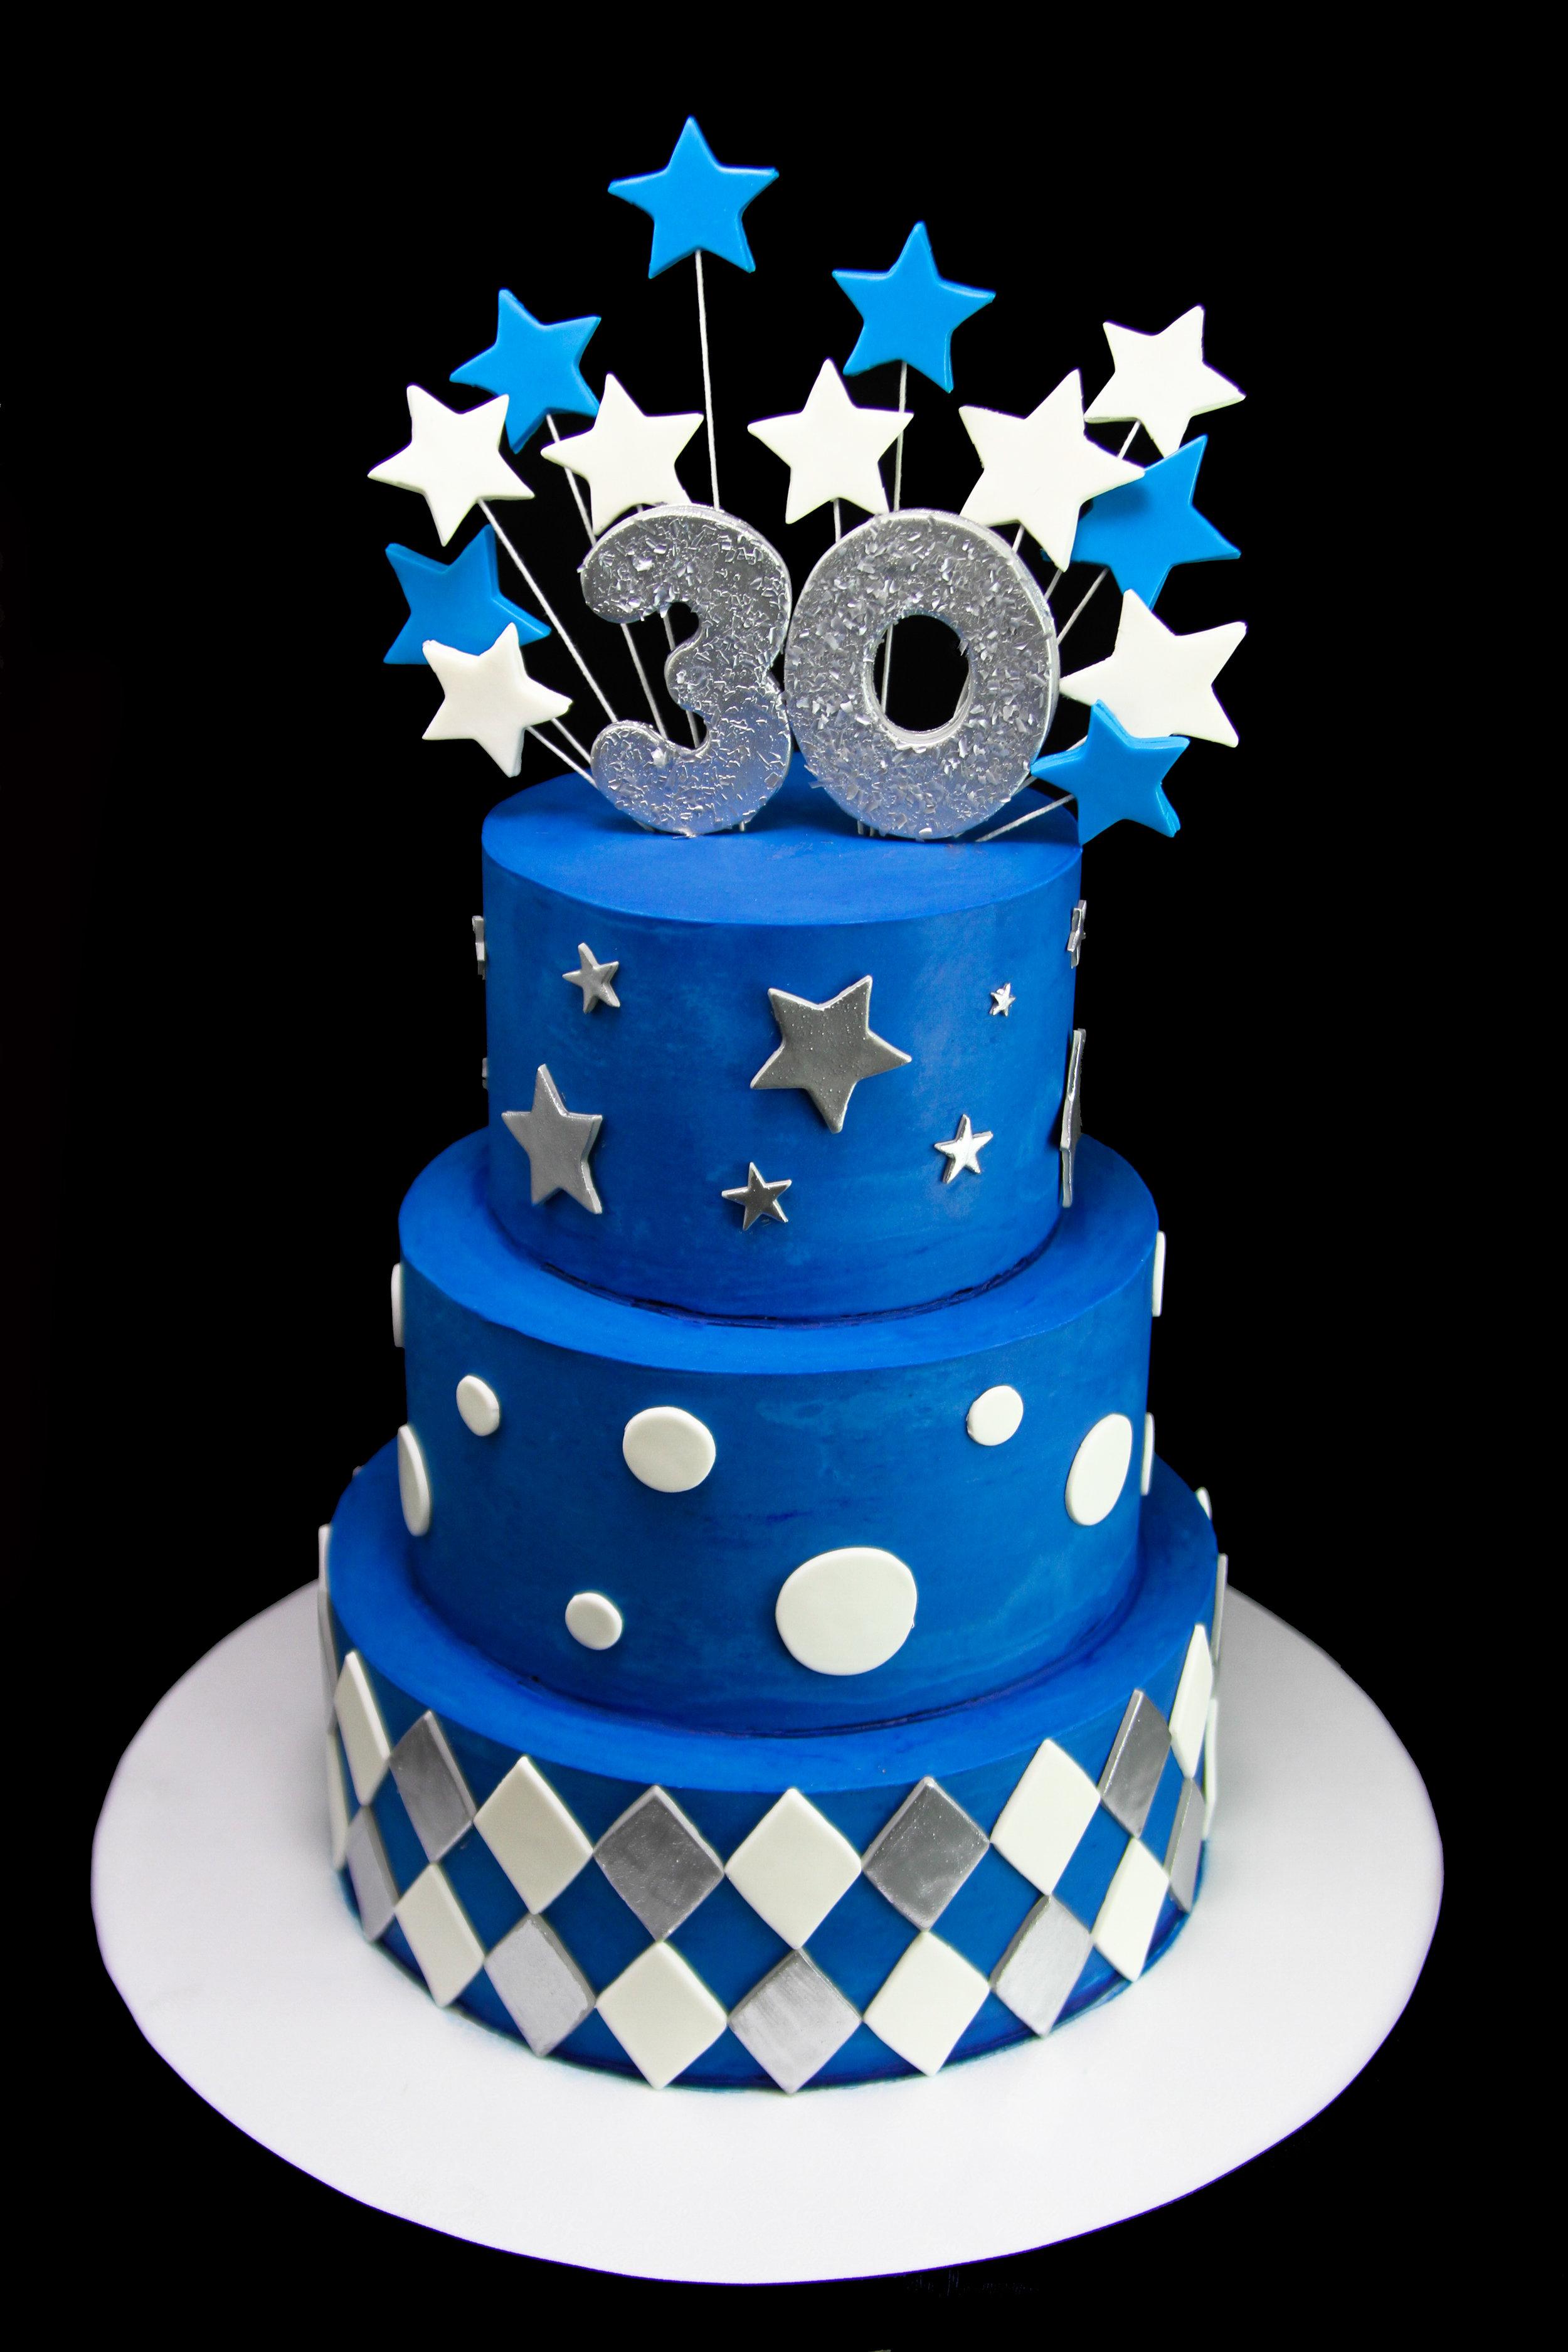 Chevron 30th Birthday Cake.jpg